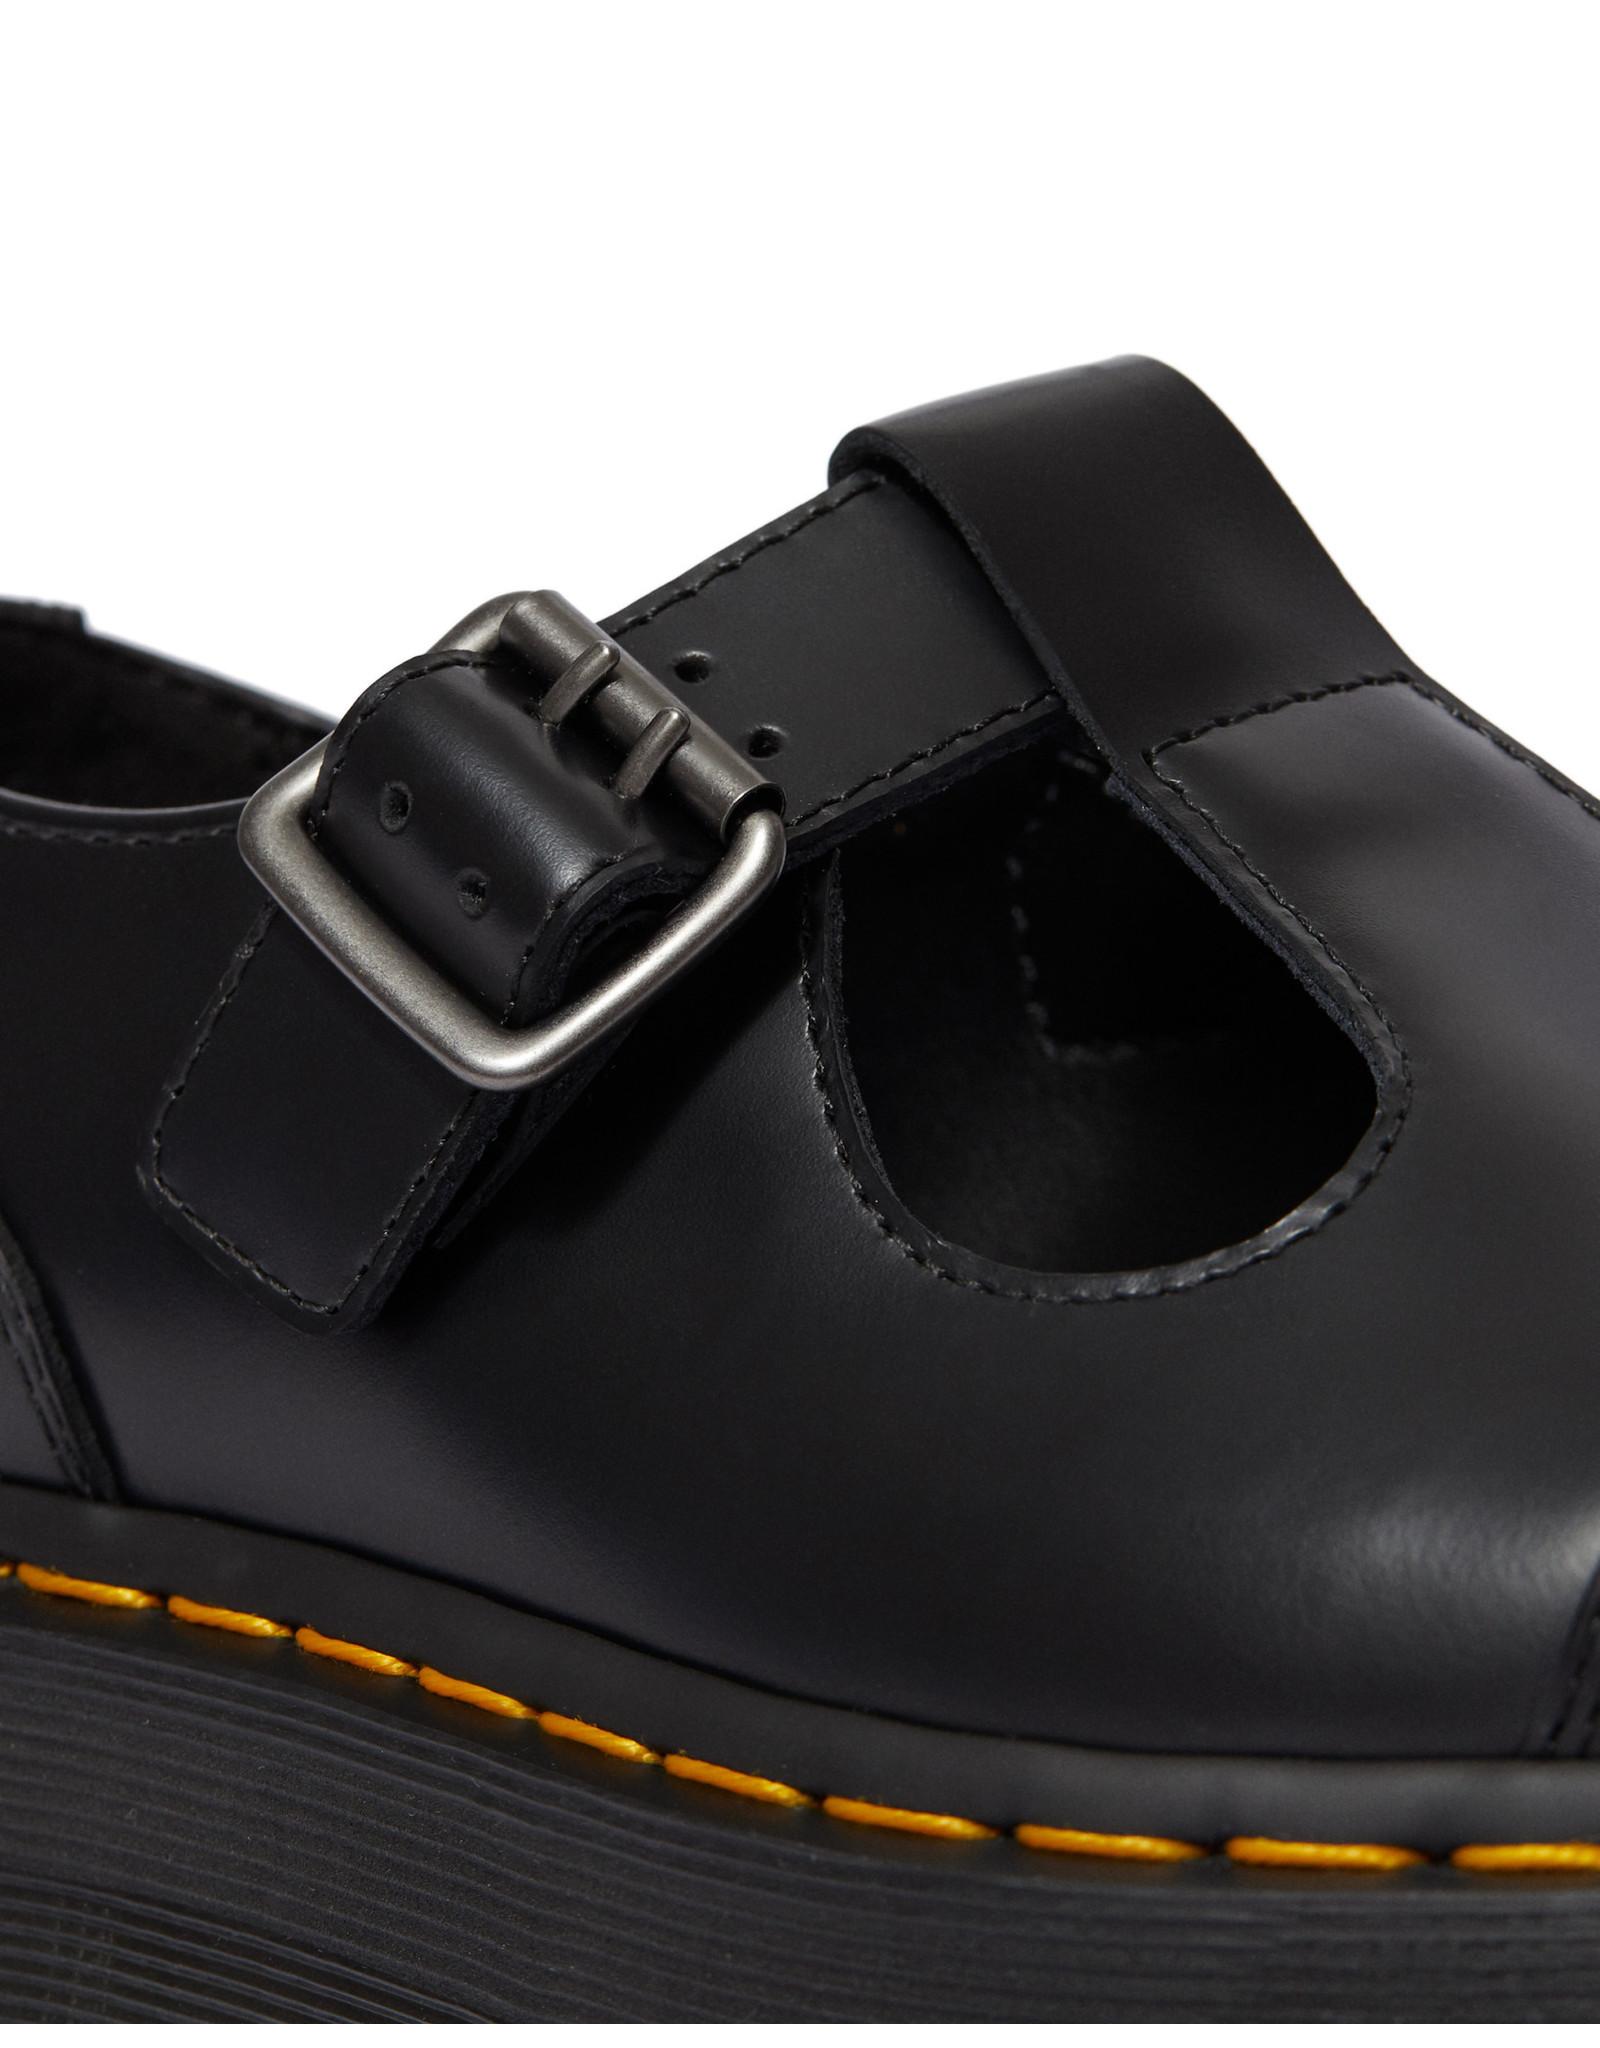 DR. MARTENS BETHAN BLACK SMOOTH M99BX-R15727001